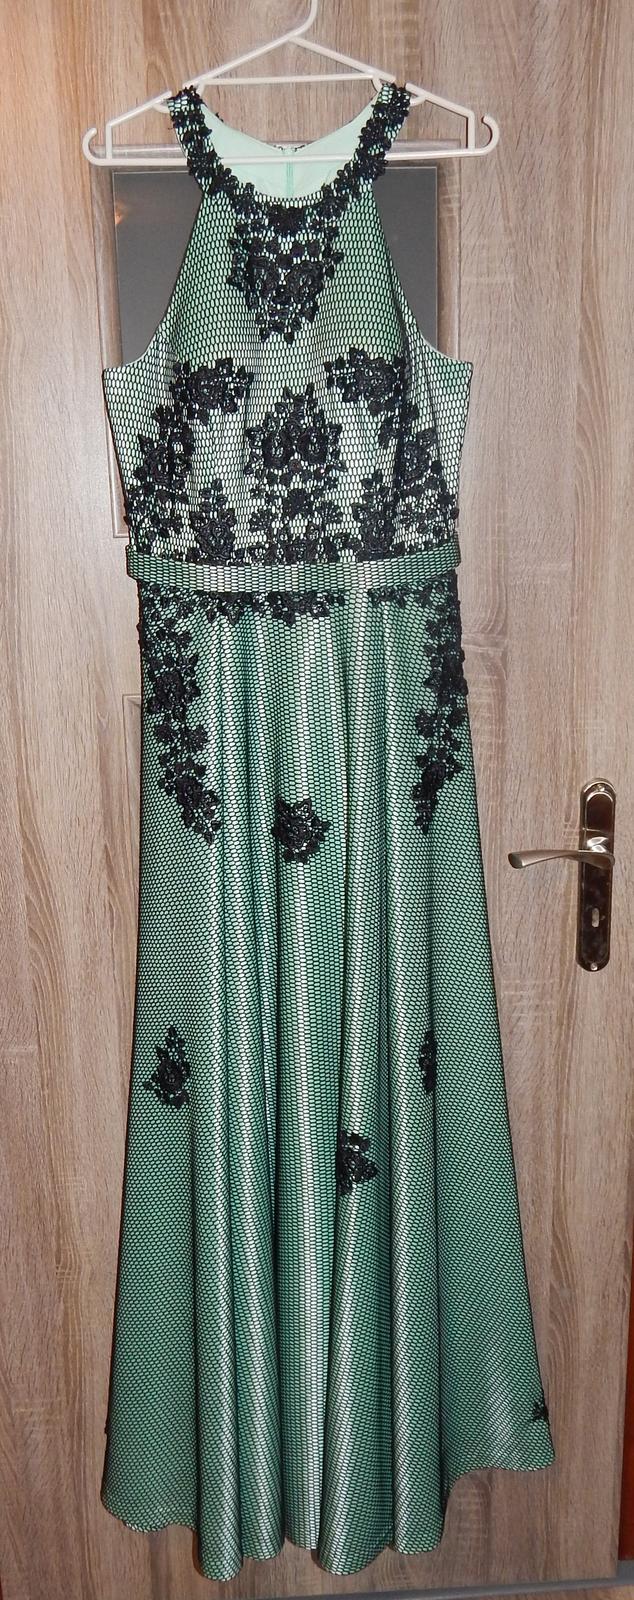 spoločenské šaty 42/44 značka Michell - Obrázok č. 1